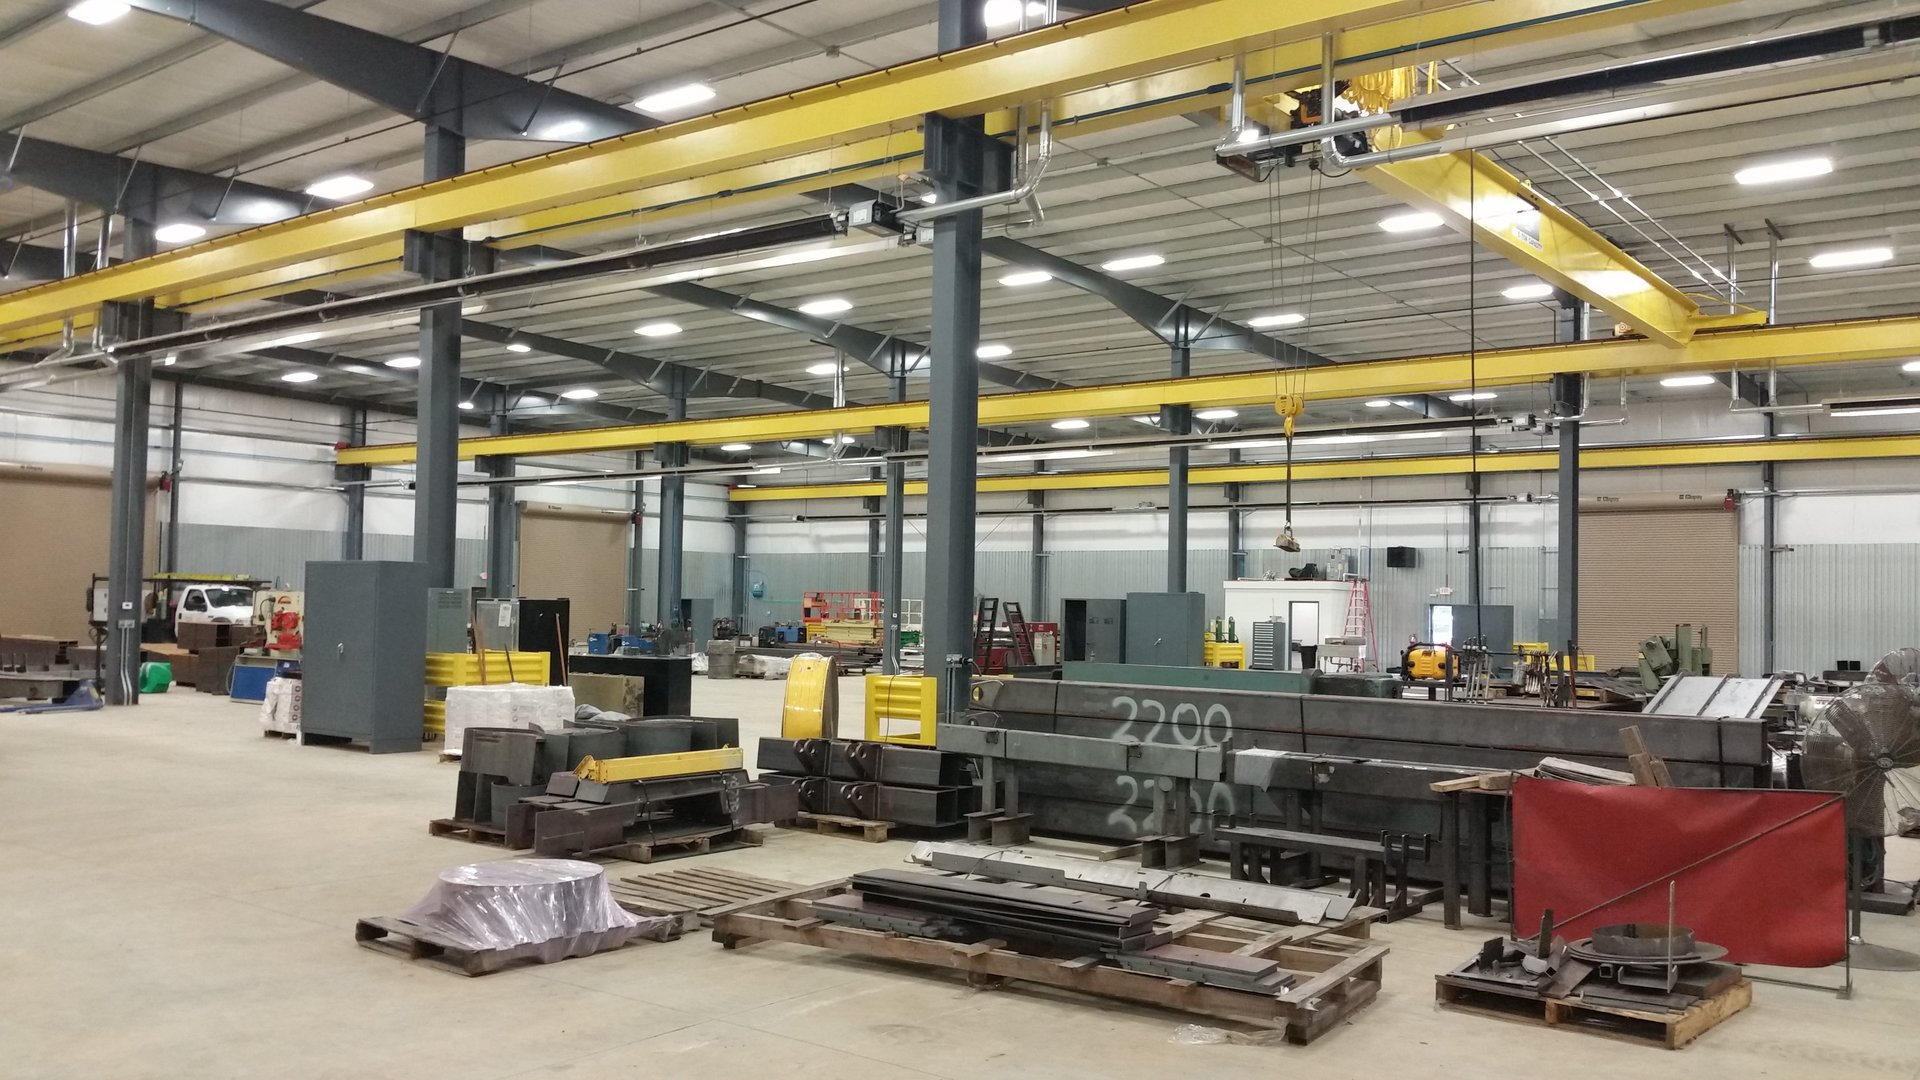 Virginia Steel